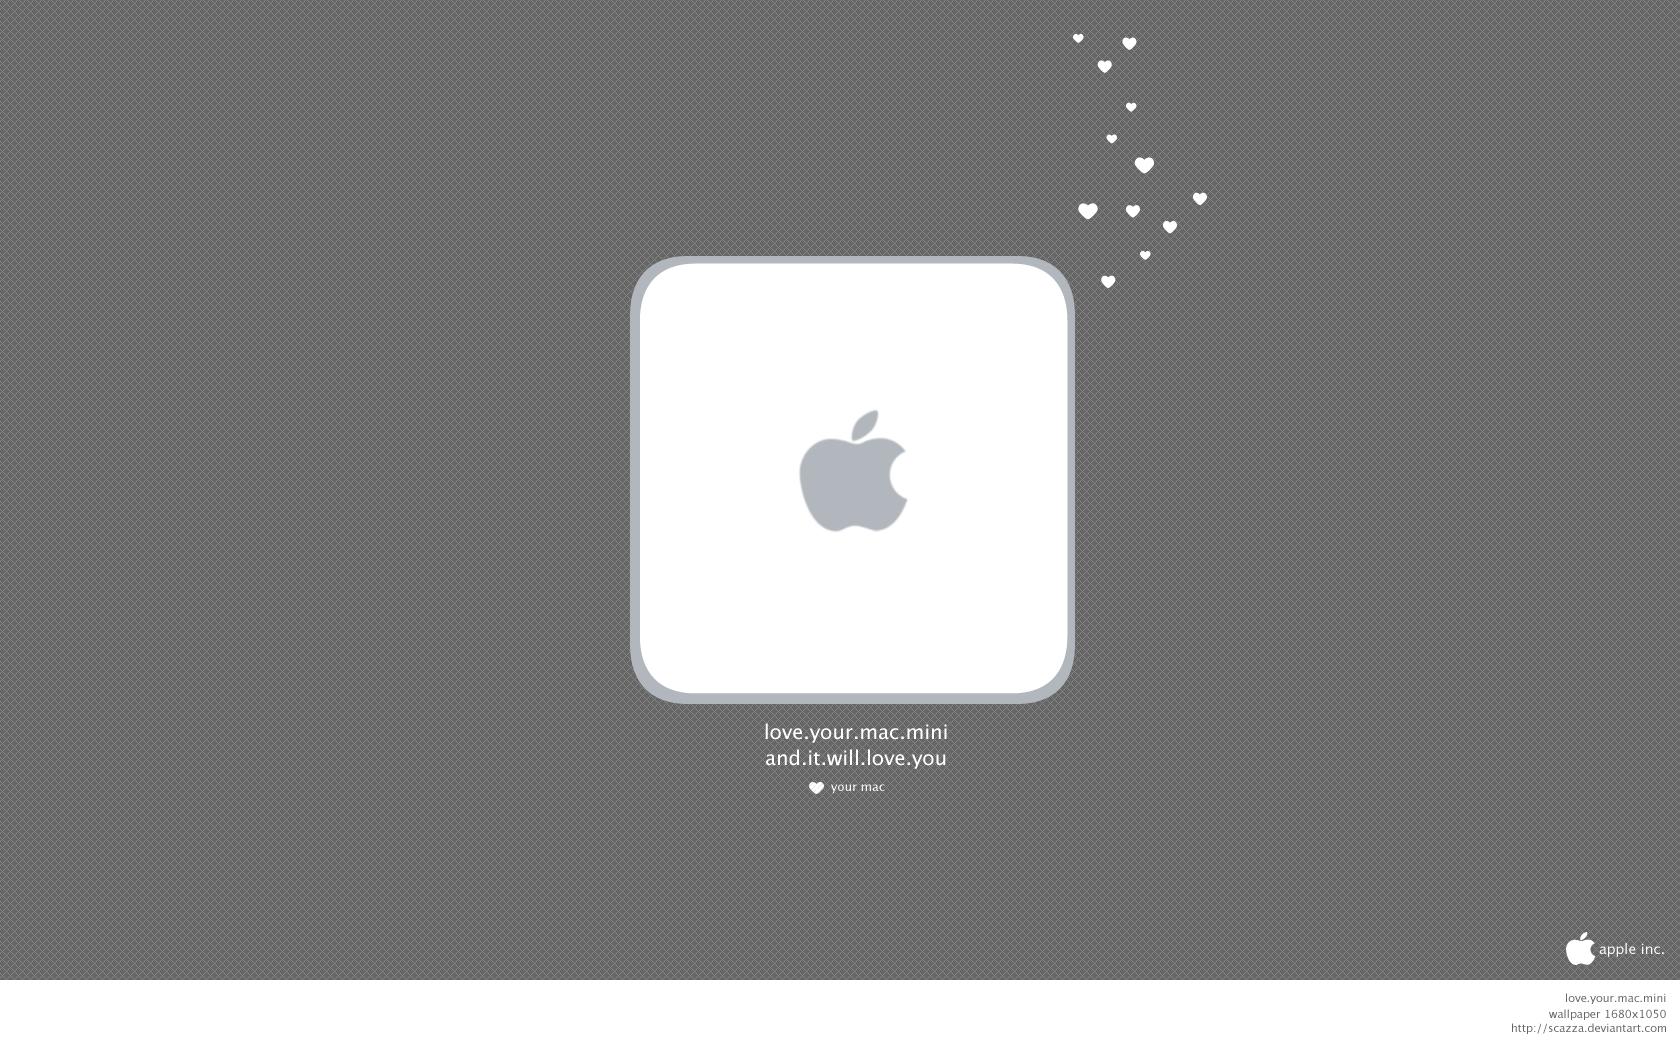 Macbook Air HD Wallpapers 30 Freetopwallpapercom 1680x1050